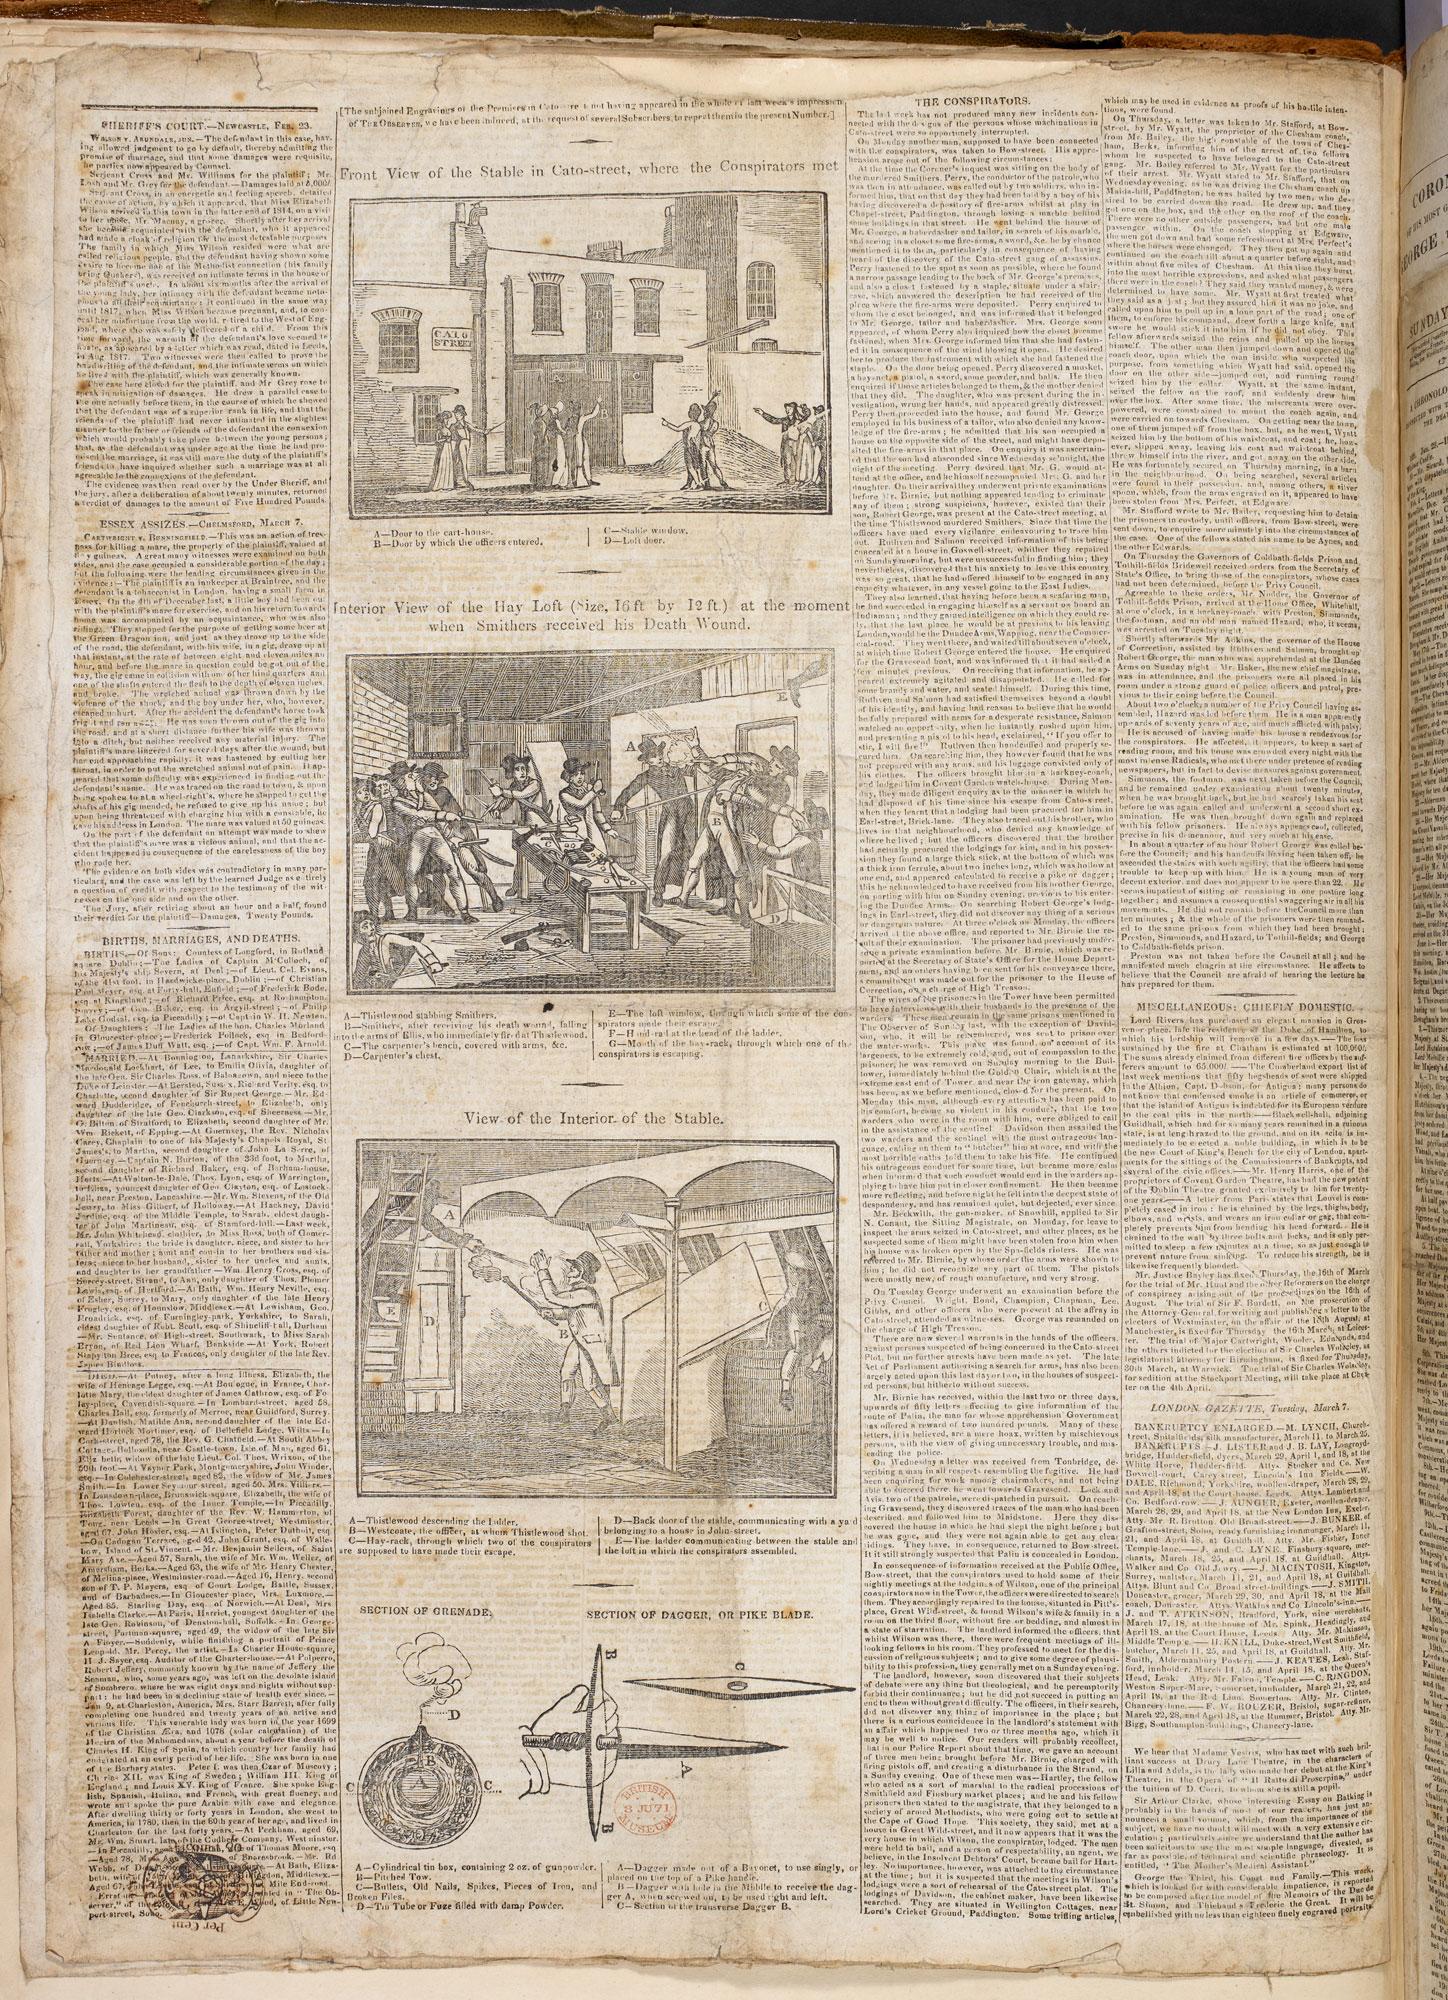 Cato-Street conspirators [page: 0]